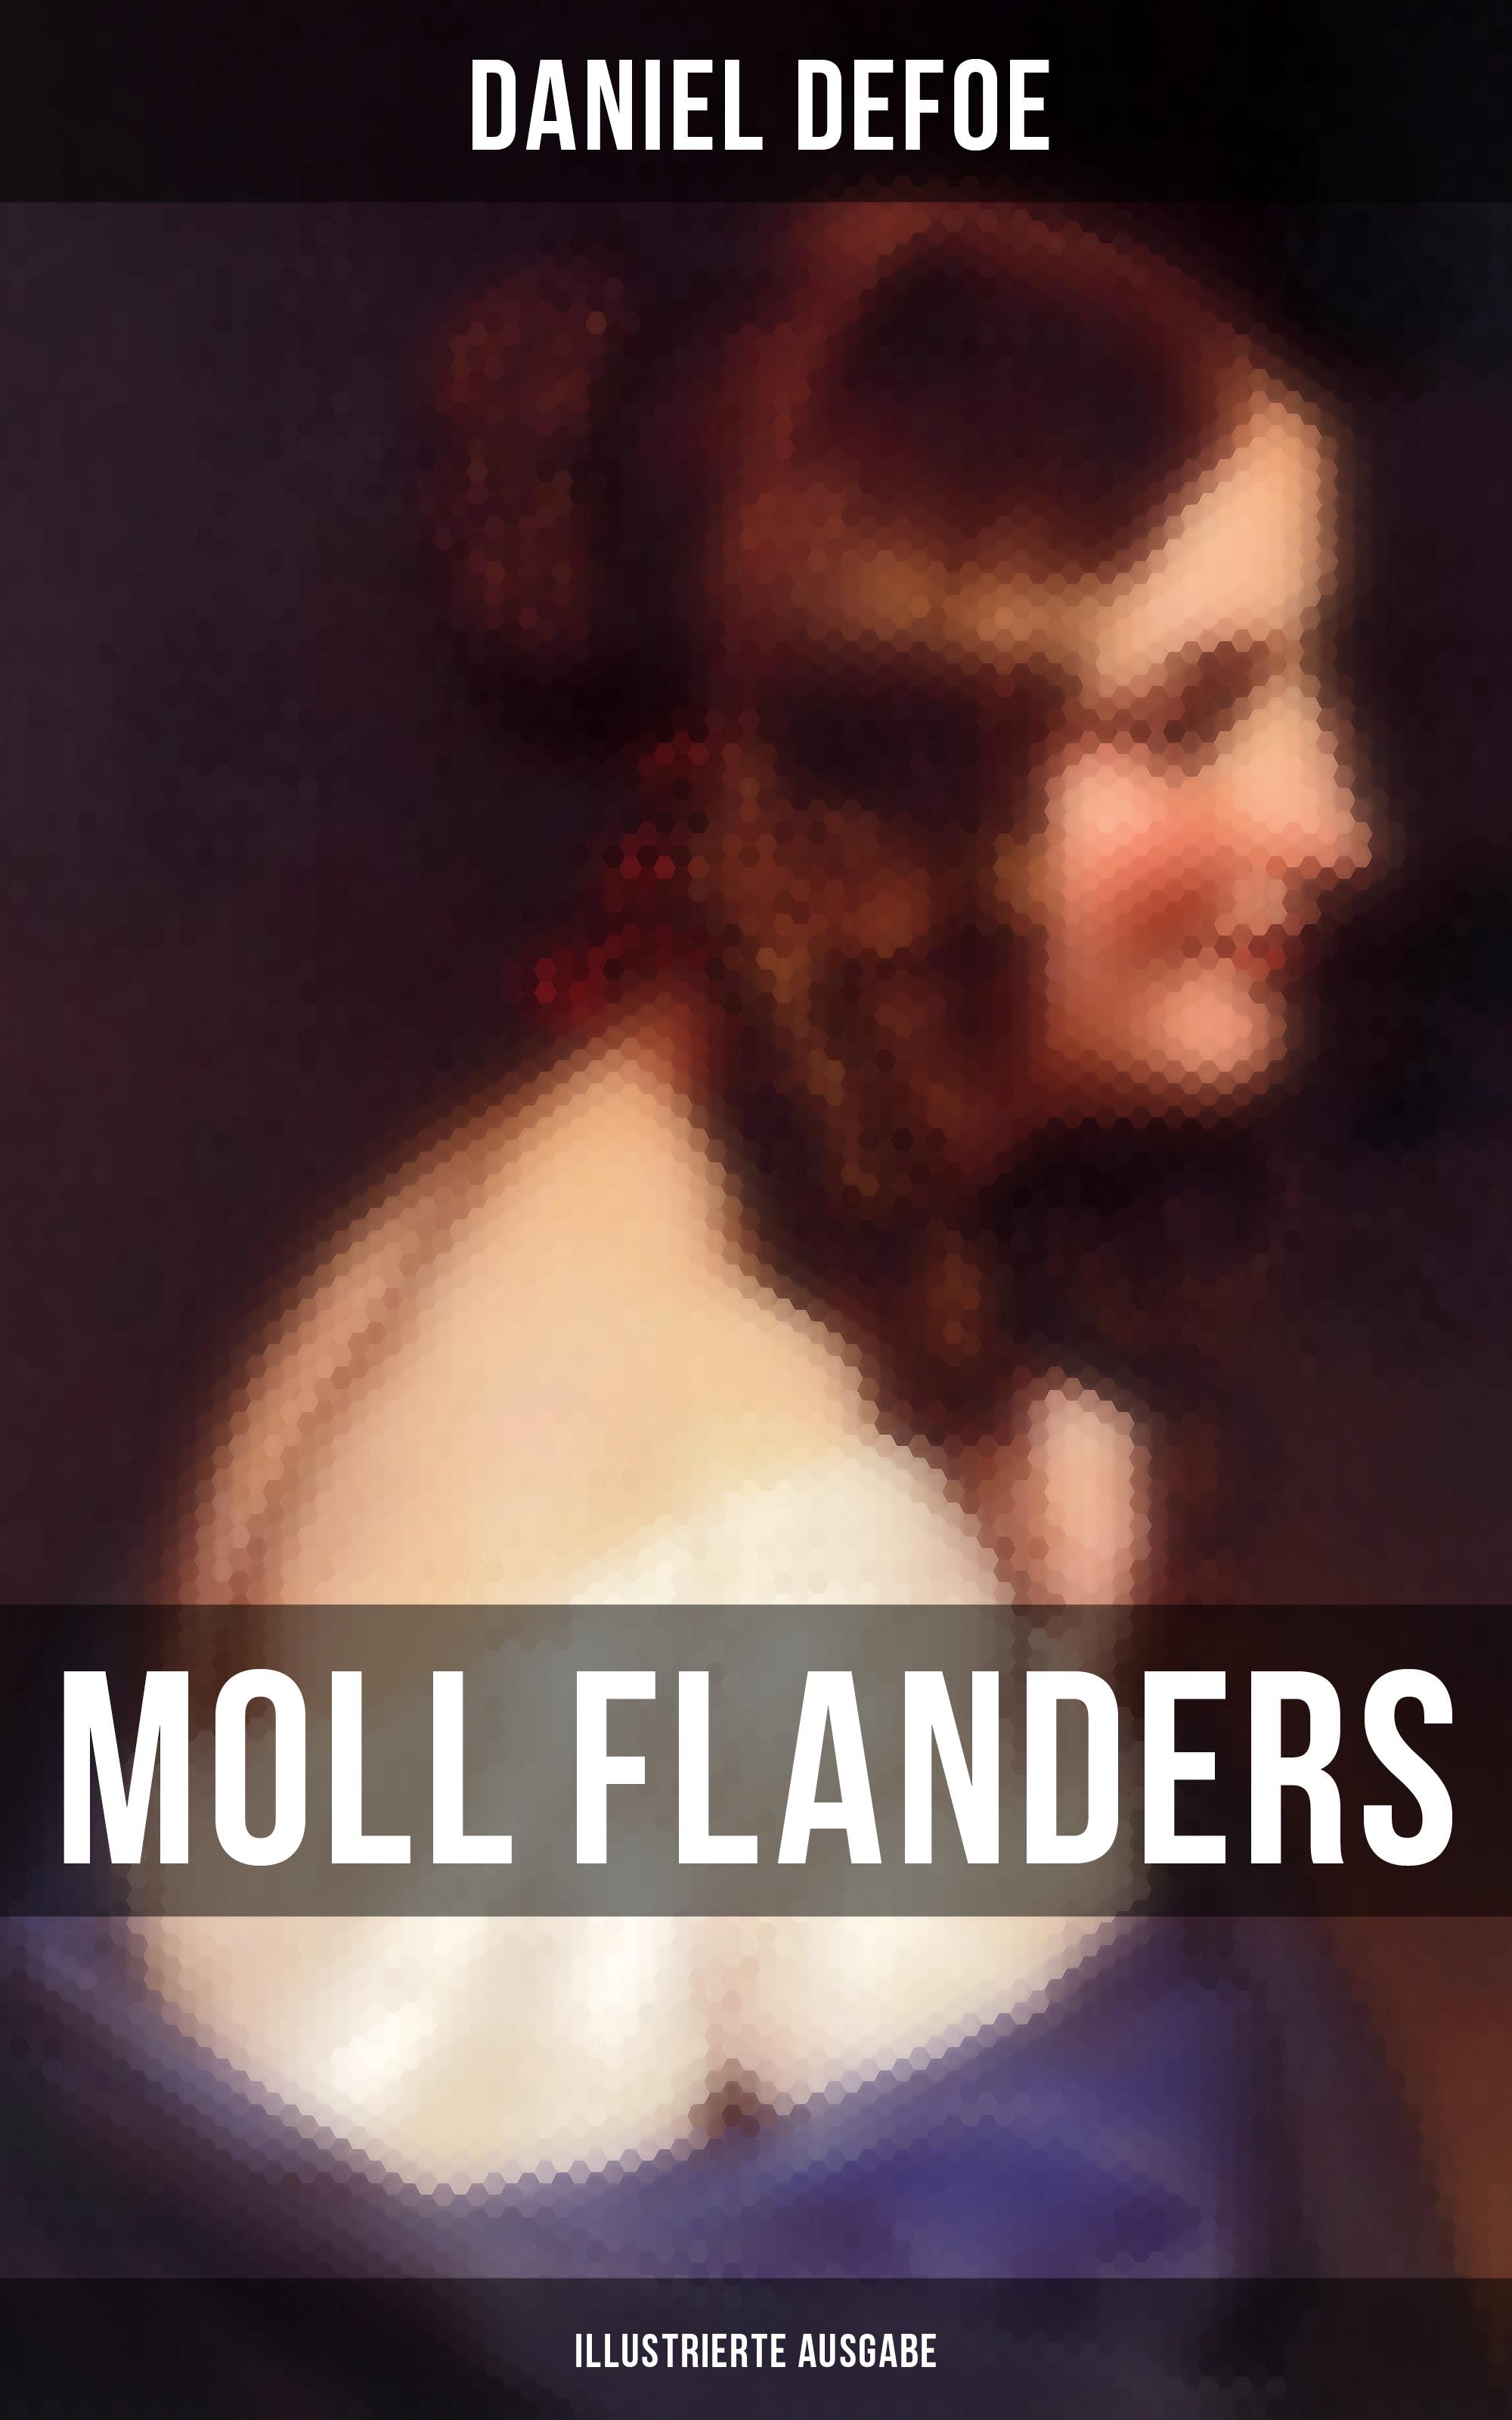 moll flanders illustrierte ausgabe